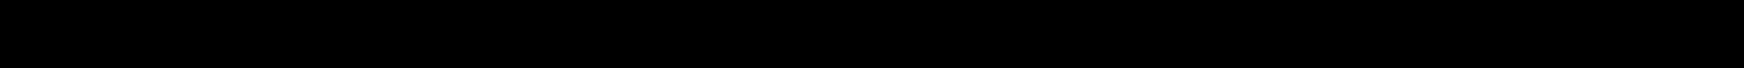 NeutrafaceSlabTextPro-Light.otf